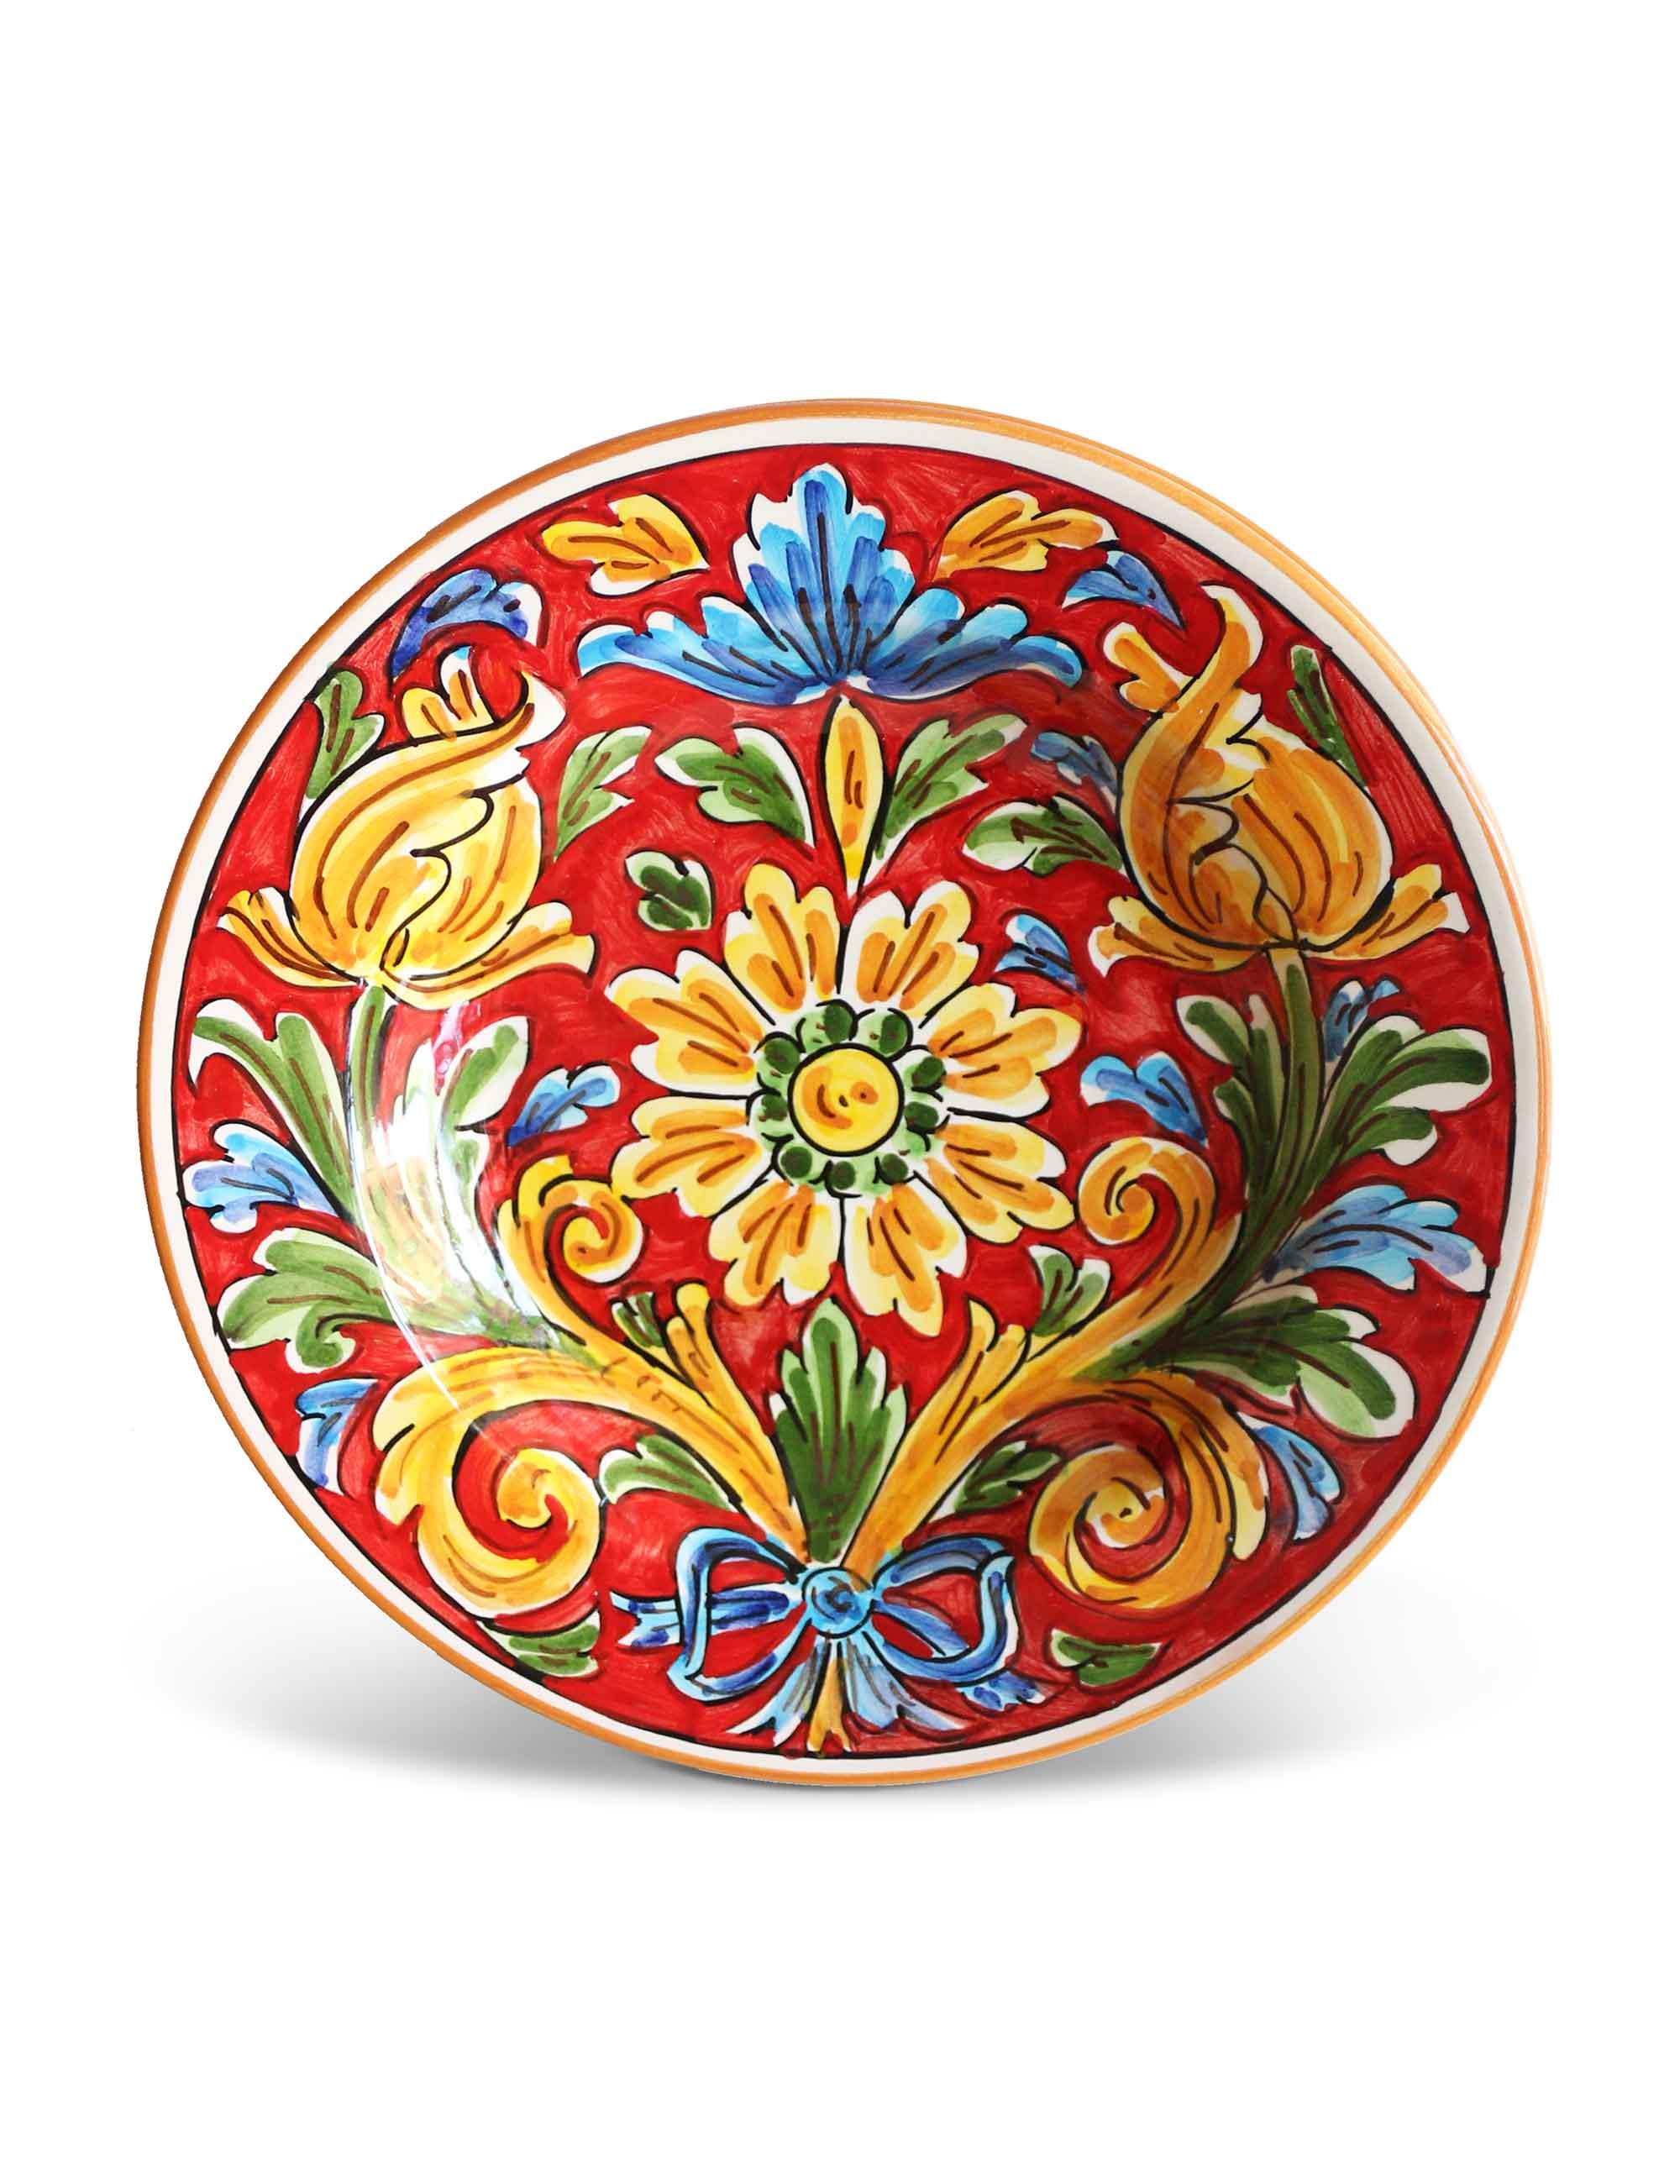 piatto fondo ceramica siciliana artigianale camastra